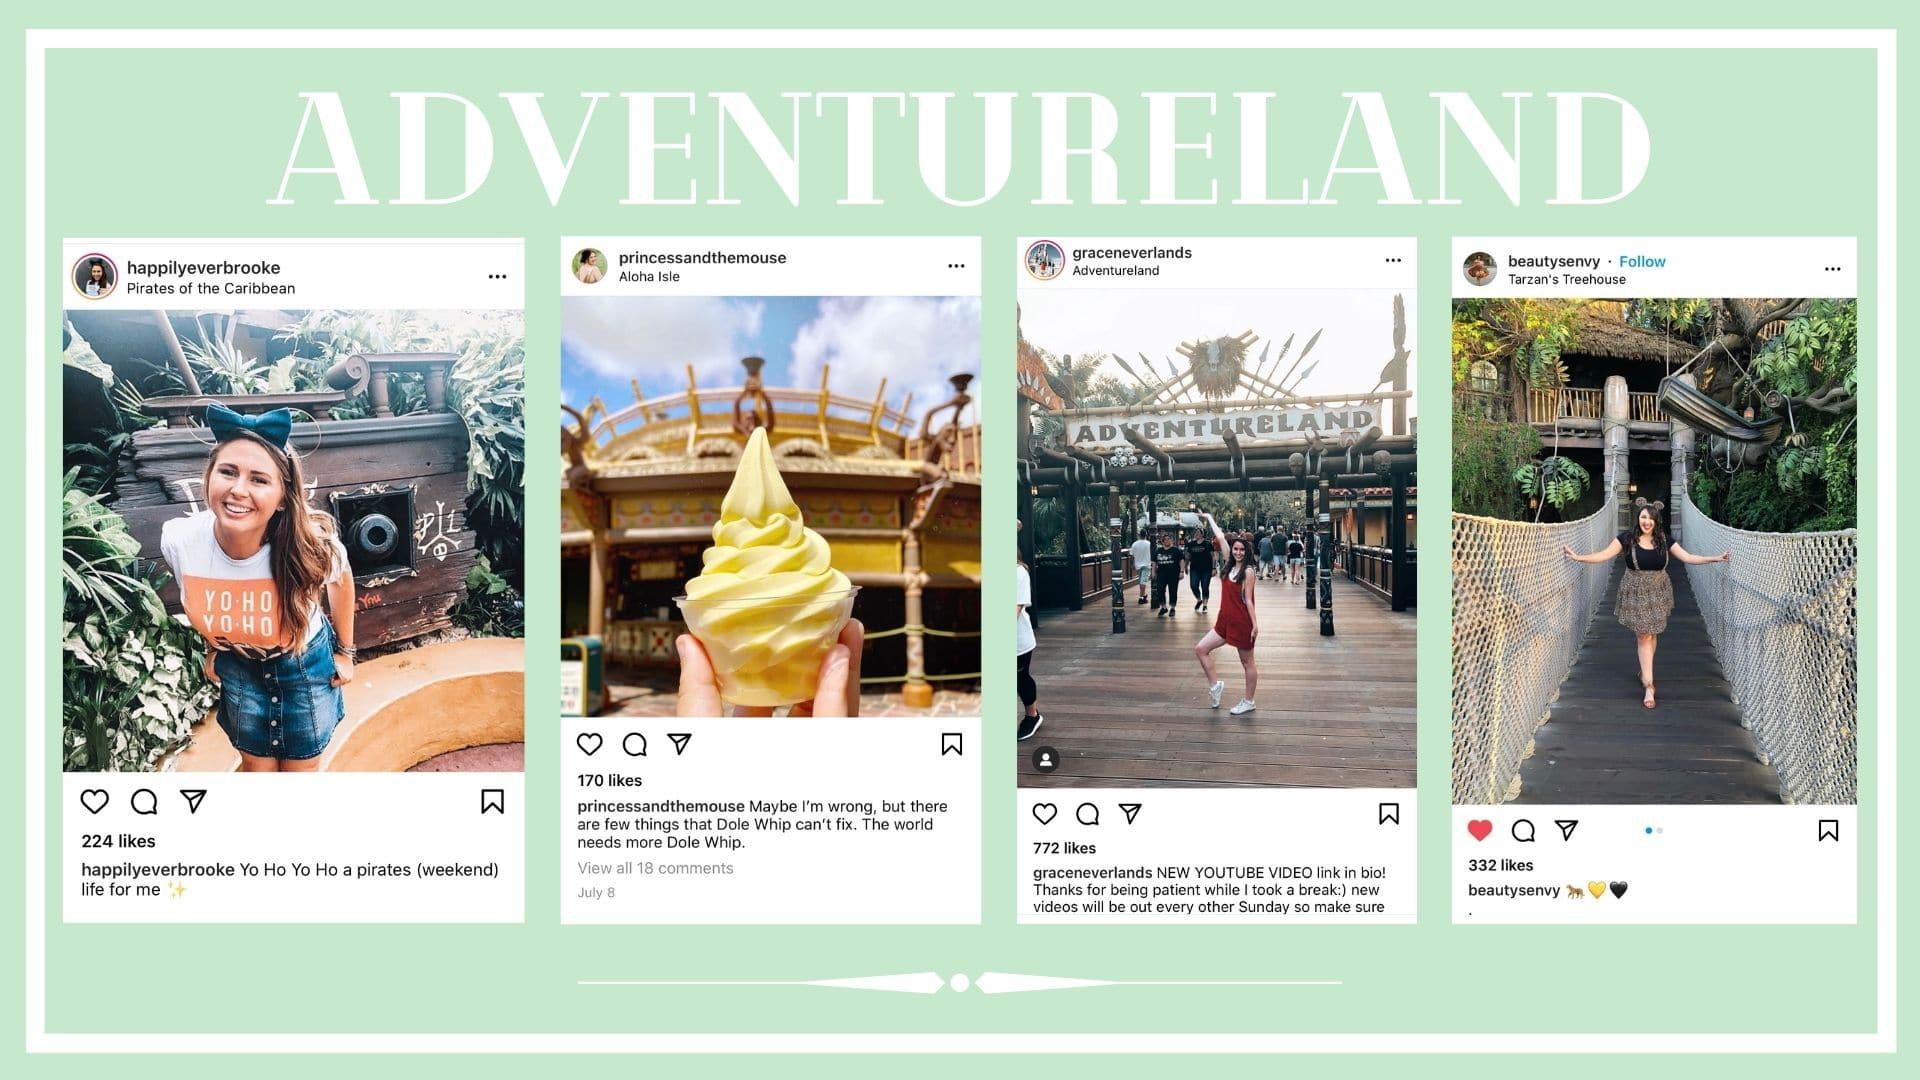 Instagram pictures from Adventureland in Disneyland